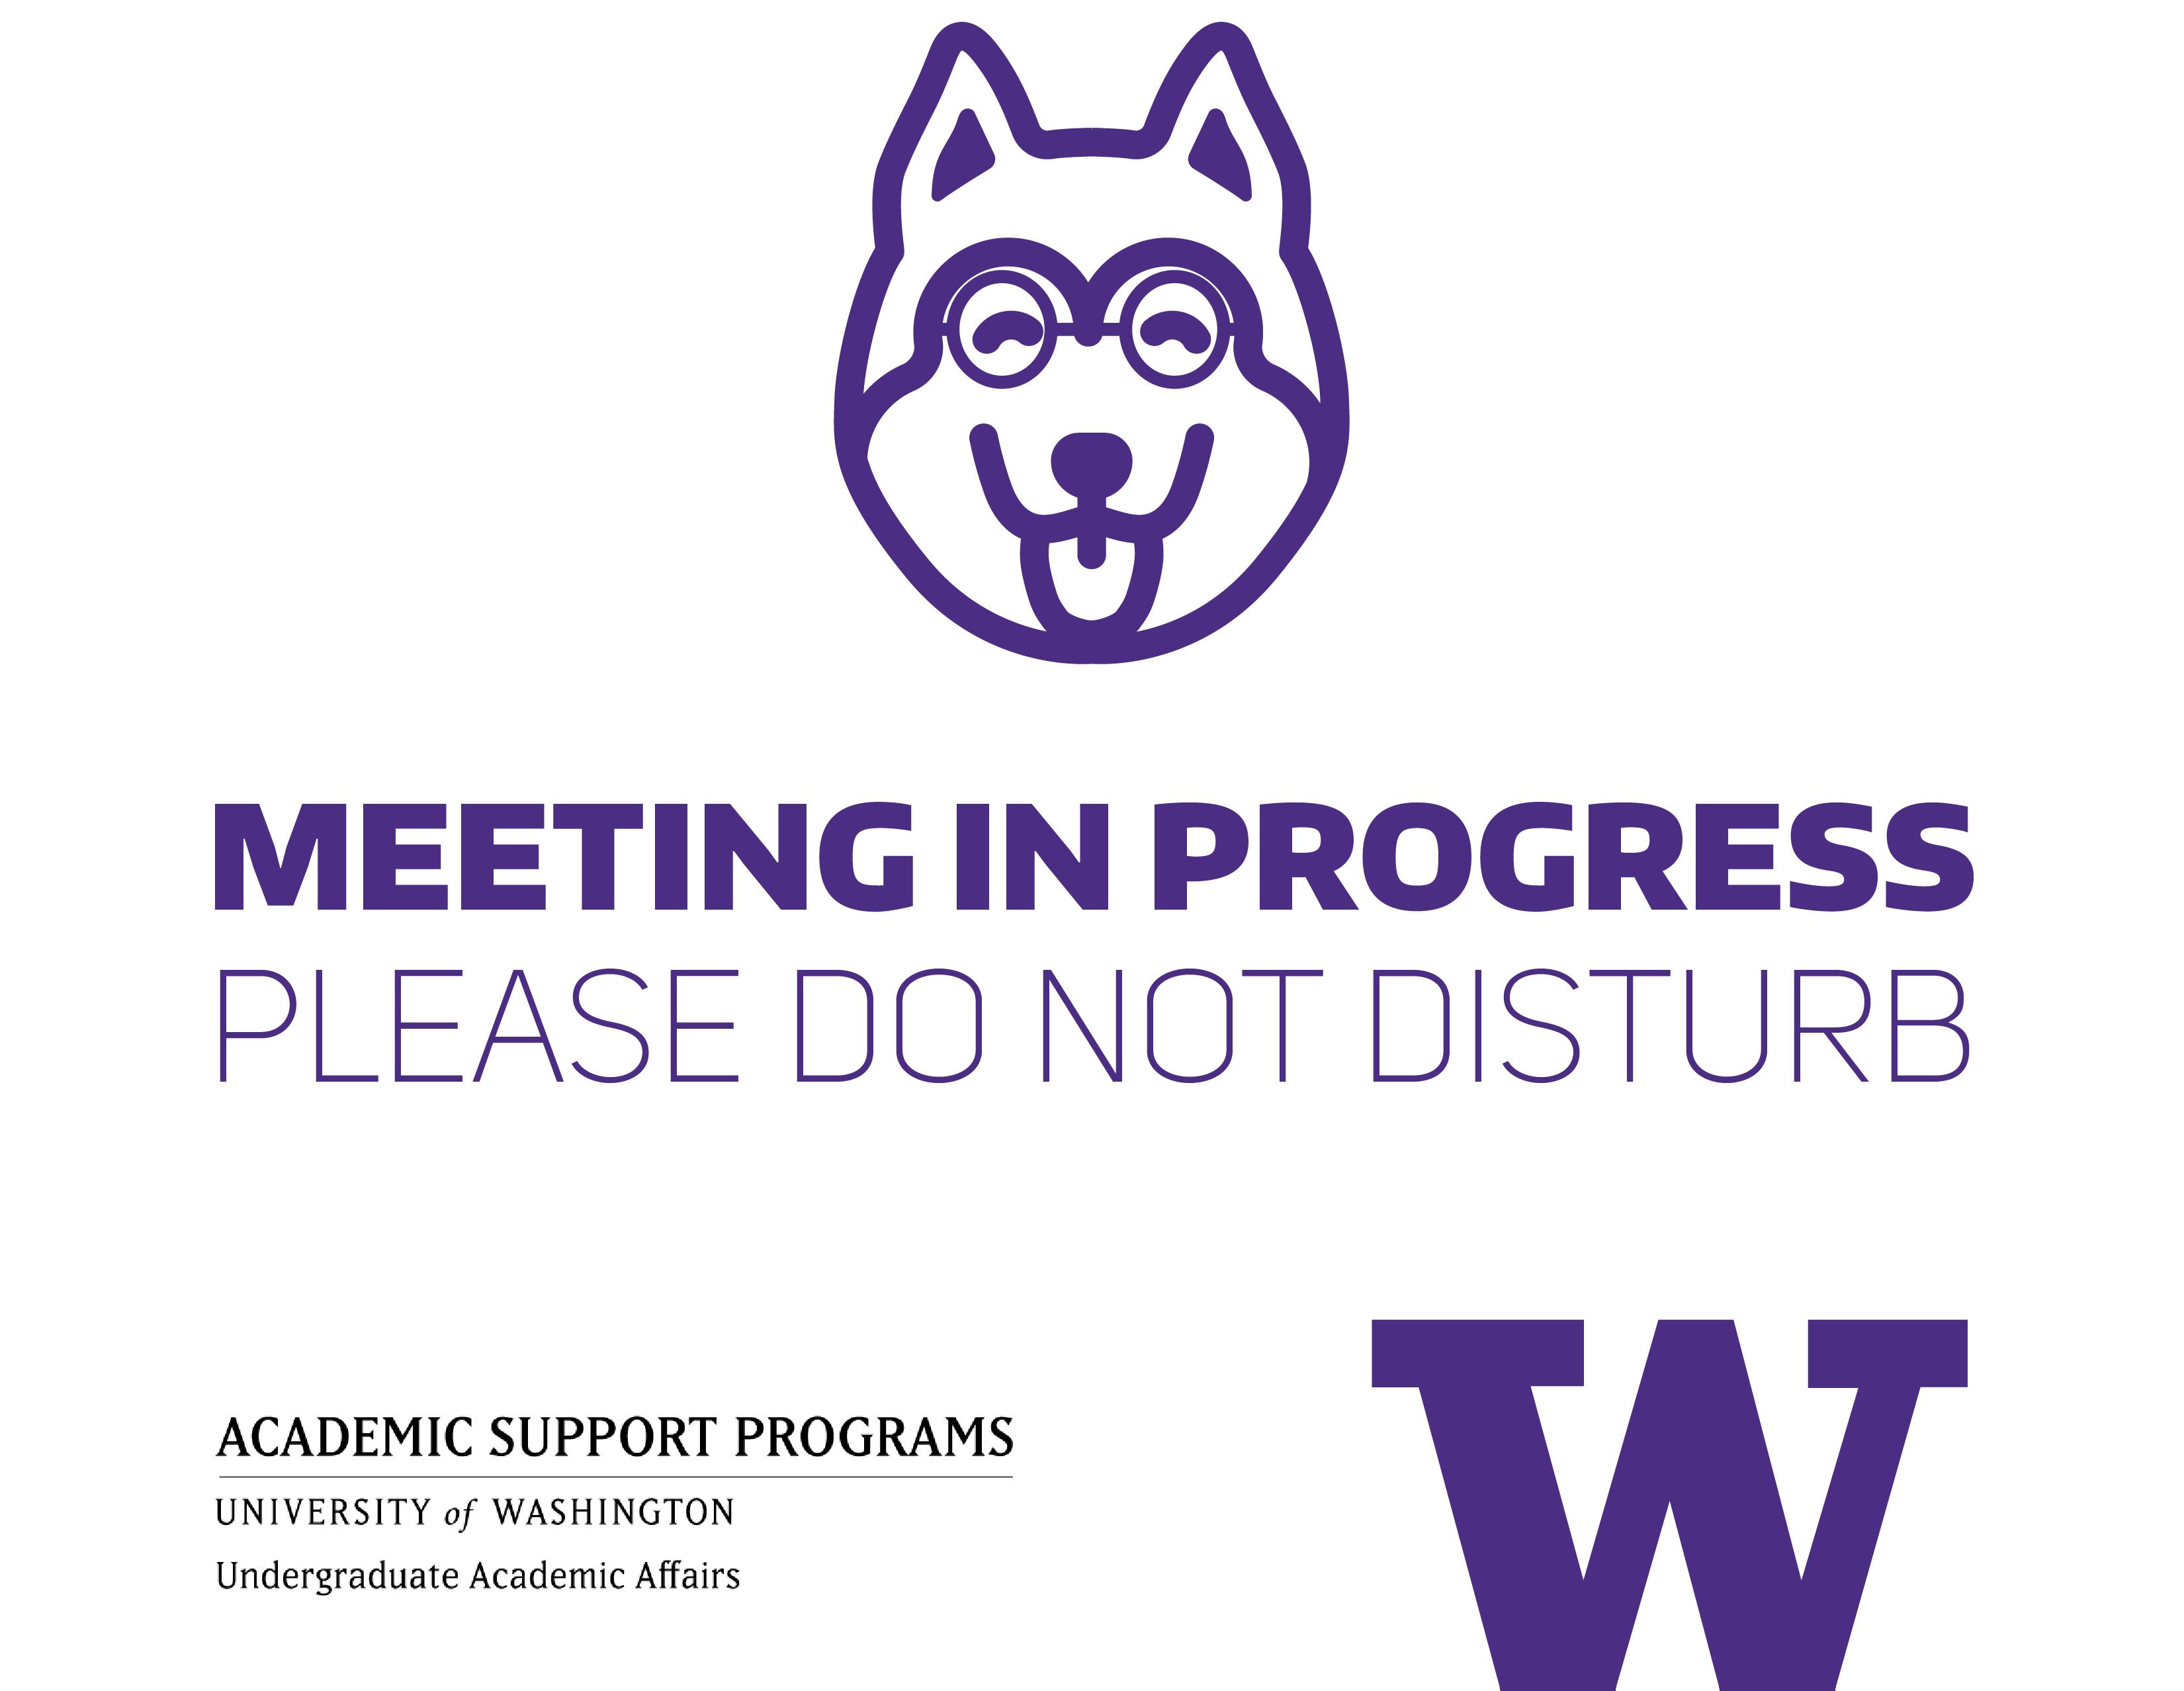 Meeting in progress - do not disturb